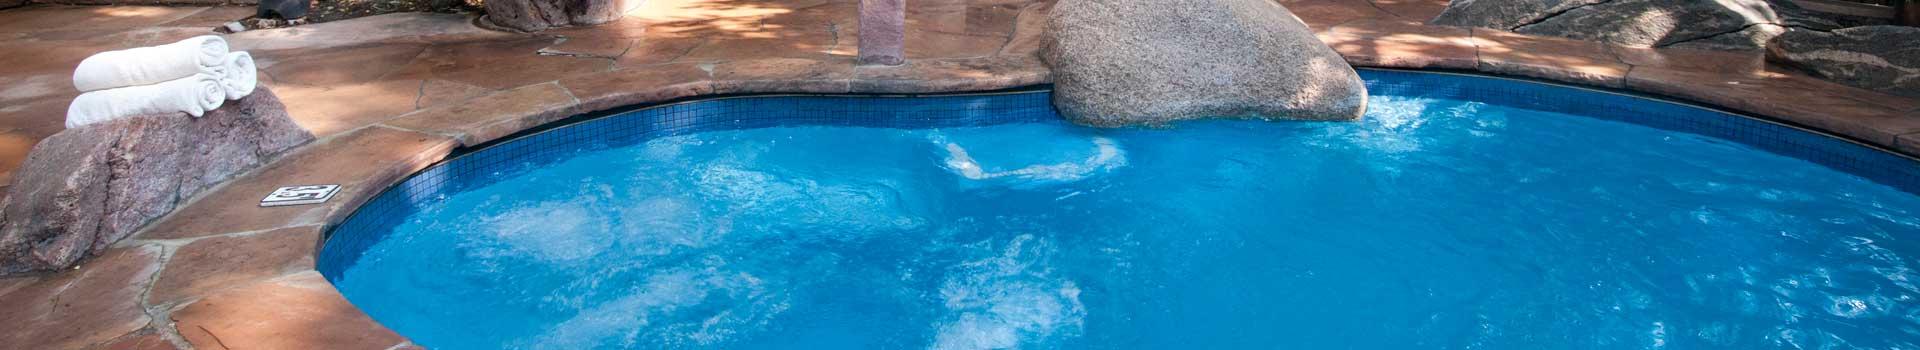 Hot Tubs at Ten Thousand Waves